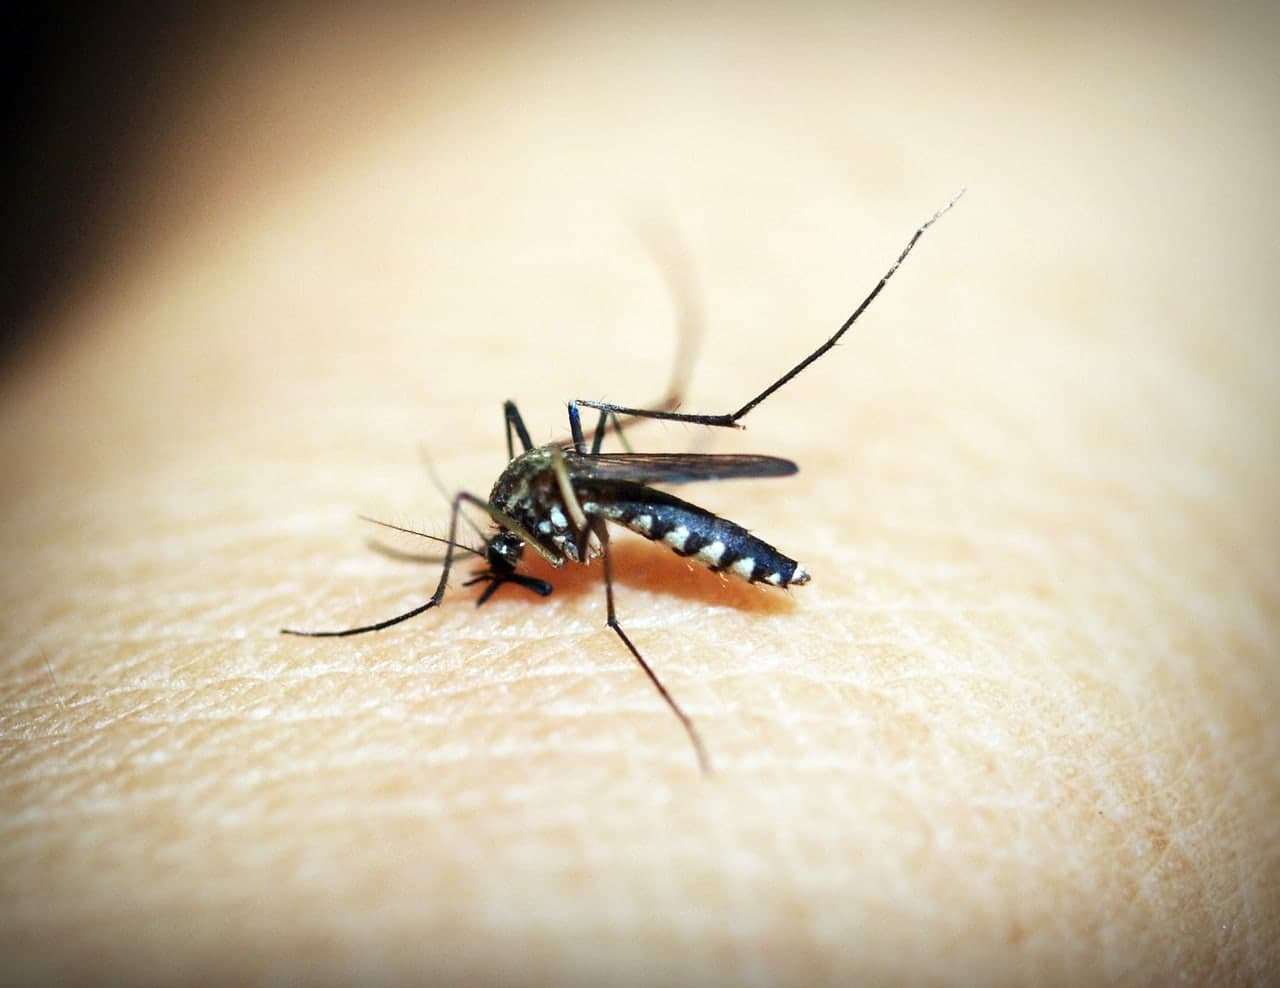 Myggstikk var ikke yrkesskade